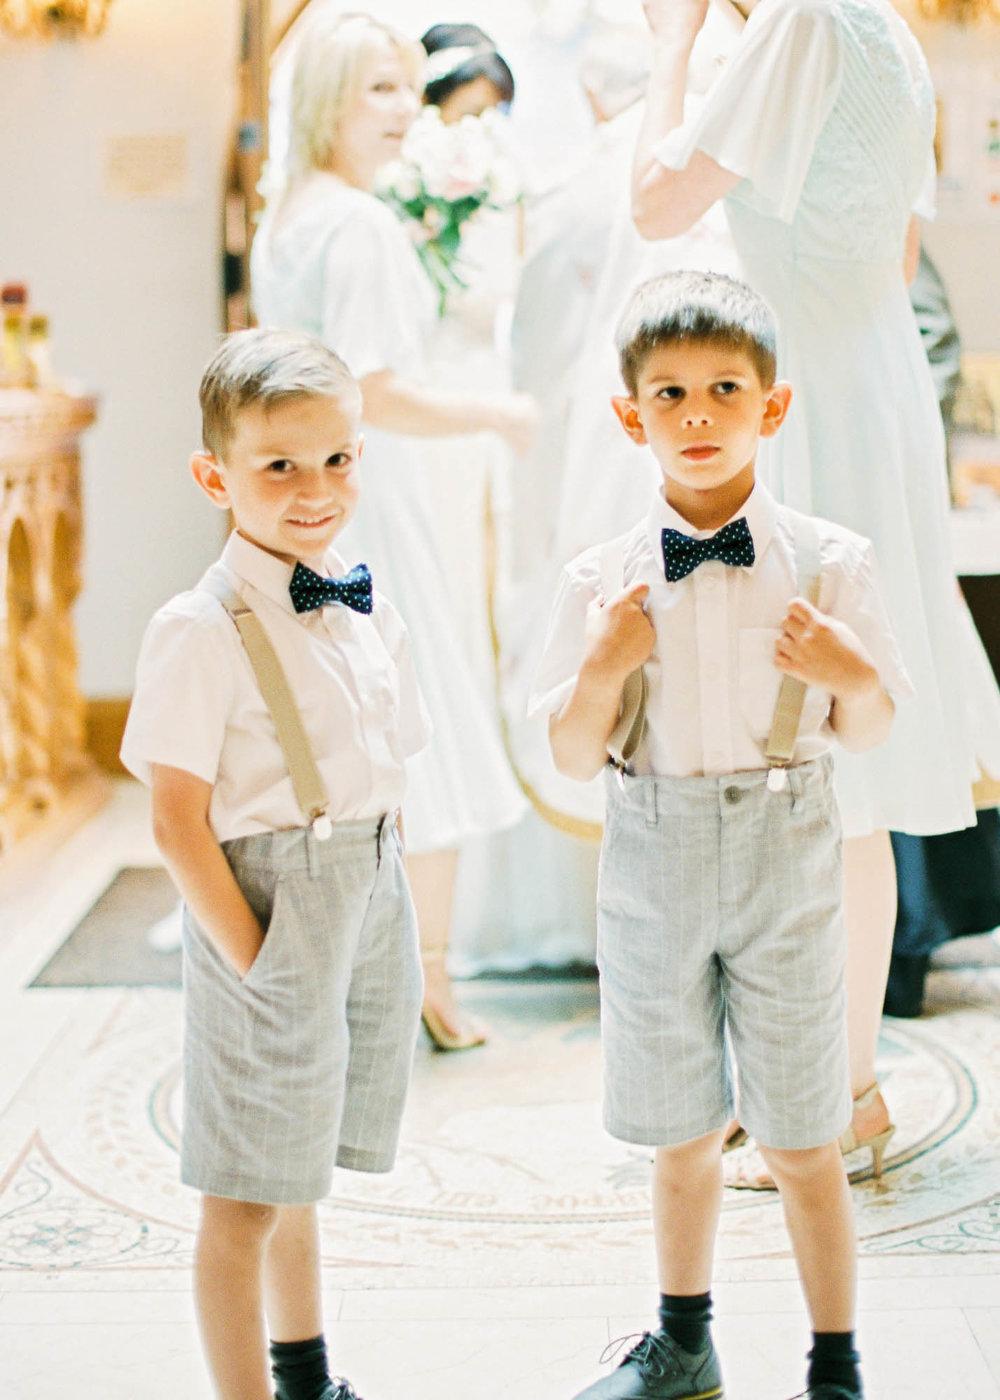 Amy O'Boyle Photography- Destination & UK Fine Art Film Wedding Photographer- Brickendonbury Estate Wedding-12.jpg